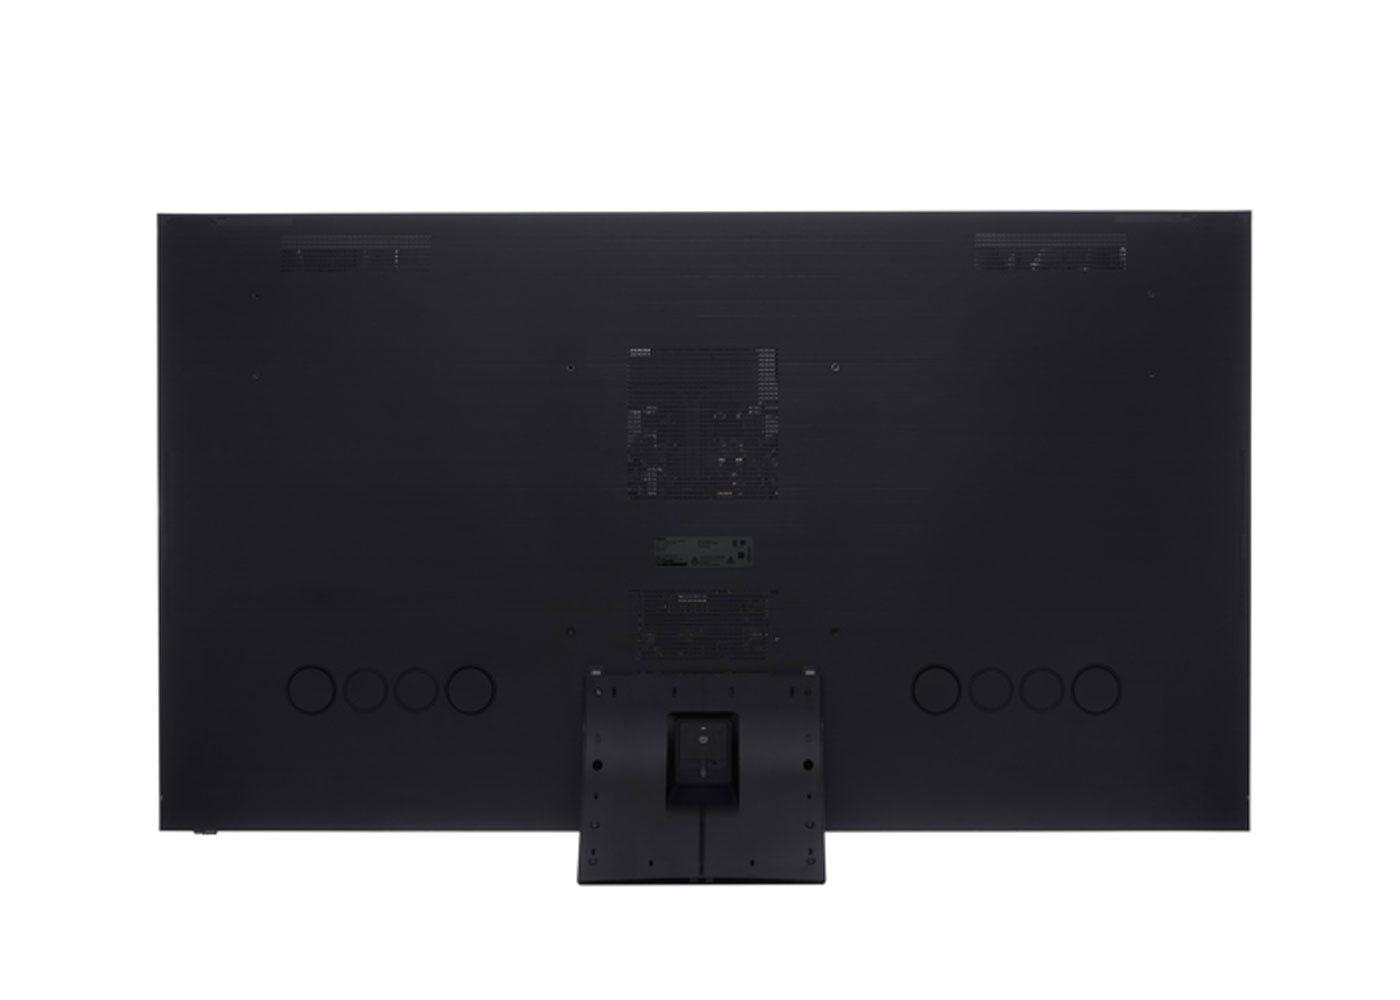 As shown: Samsung 2020 75 Q950TS Flagship QLED 8K HDR 4000 Smart TV - Rear profile.